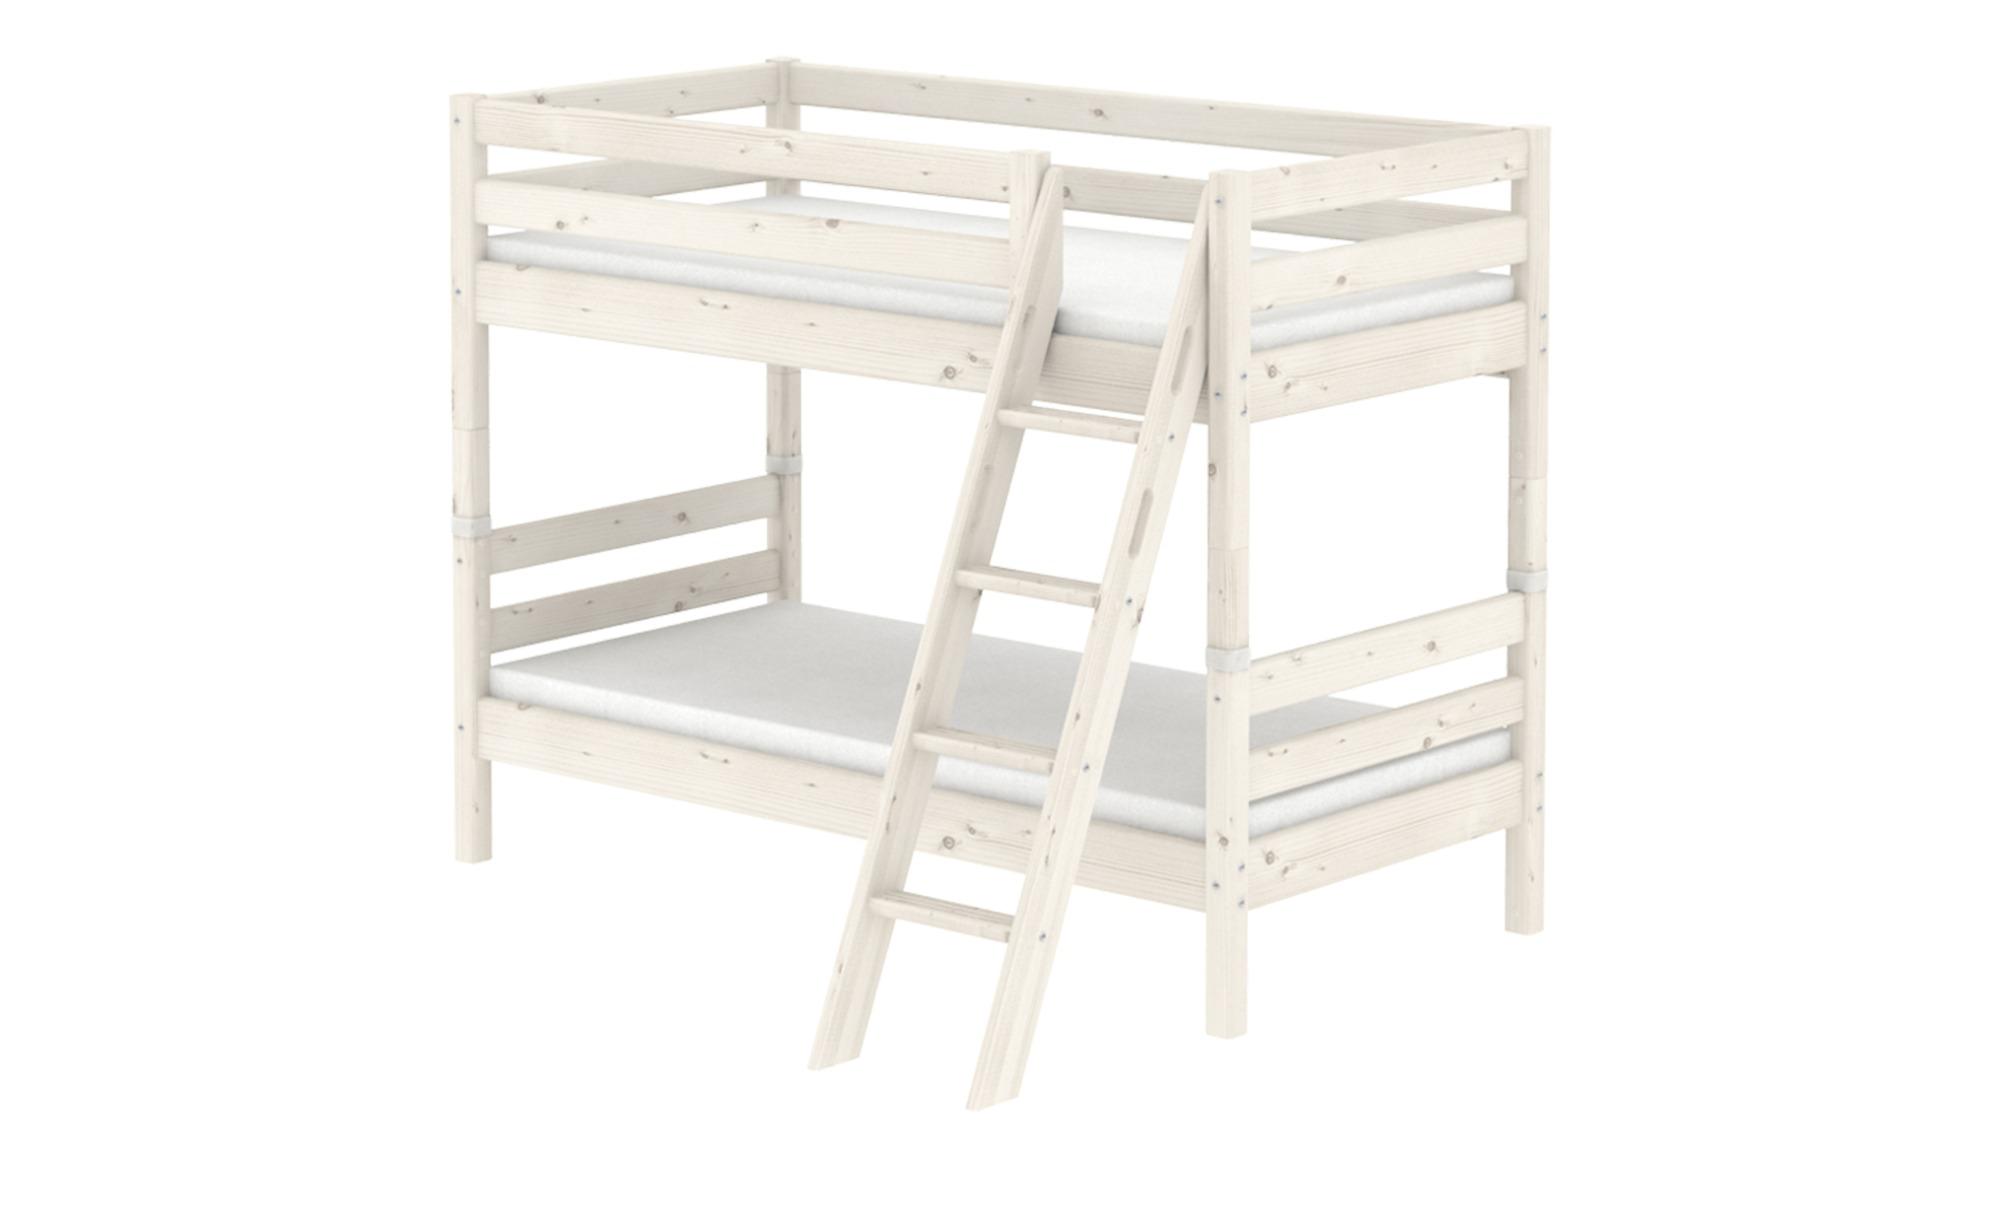 flexa etagenbett flexa classic breite 163 cm h he 154 cm wei online kaufen bei woonio. Black Bedroom Furniture Sets. Home Design Ideas